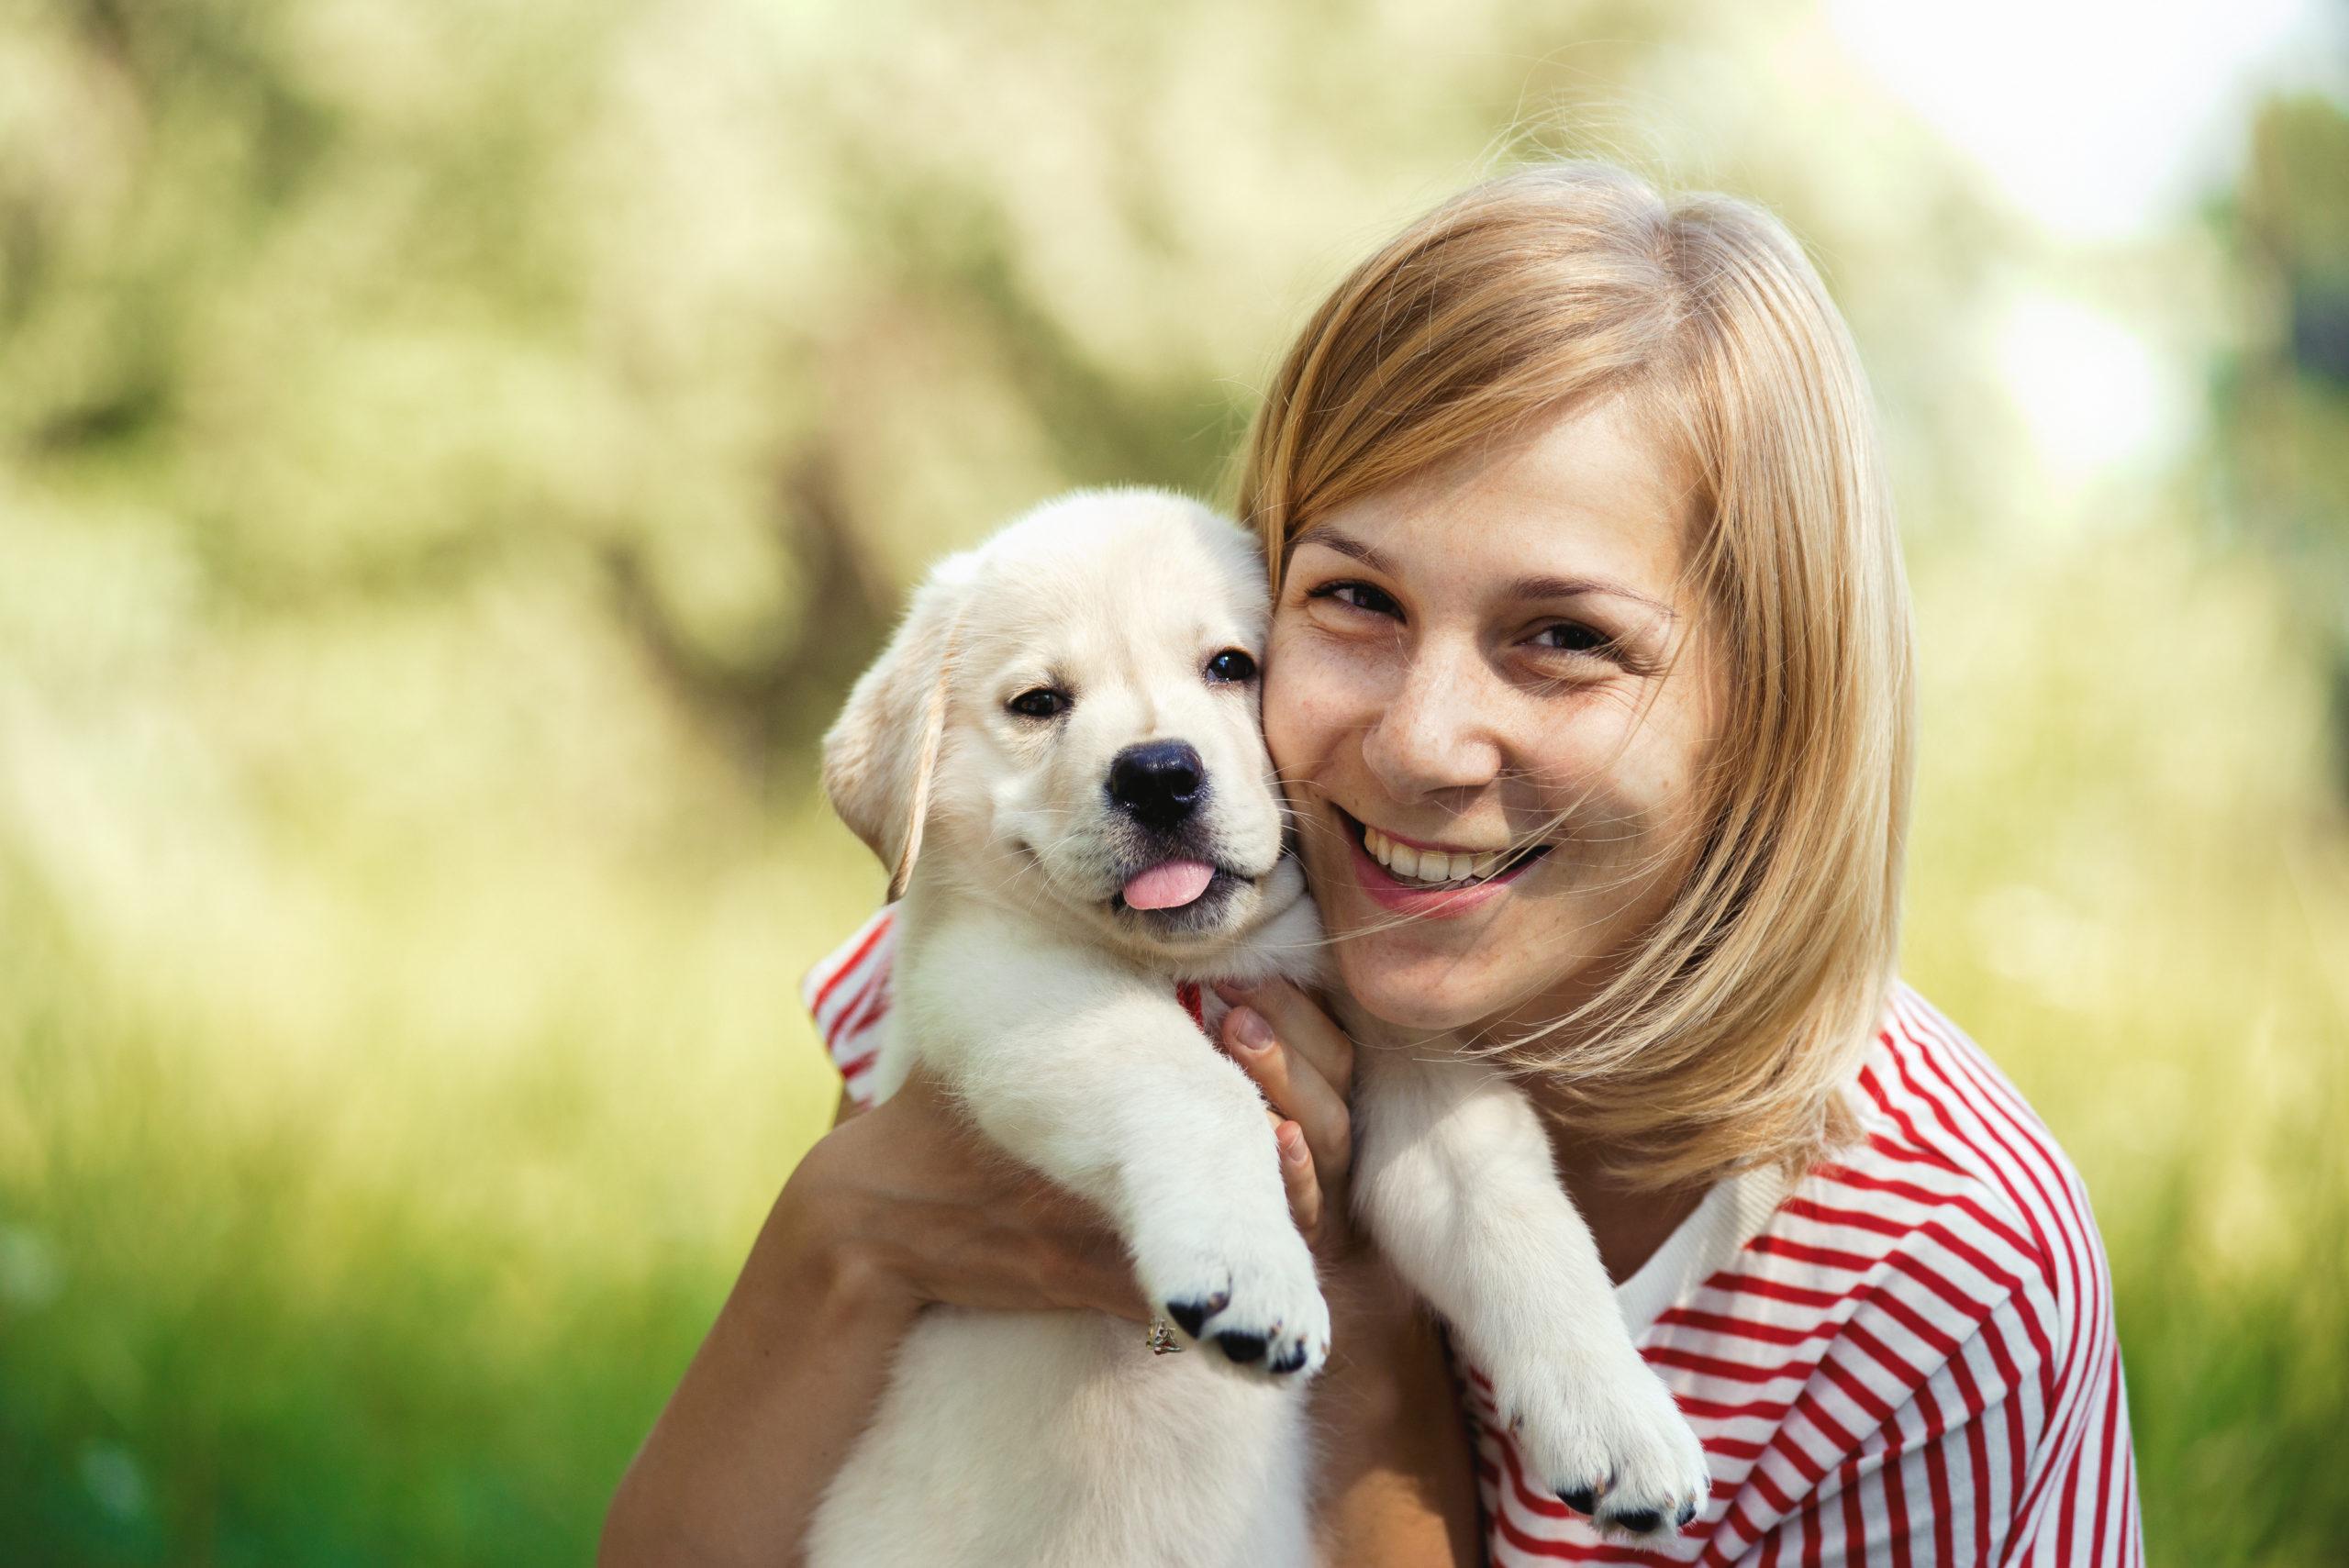 Girl with labrador puppy